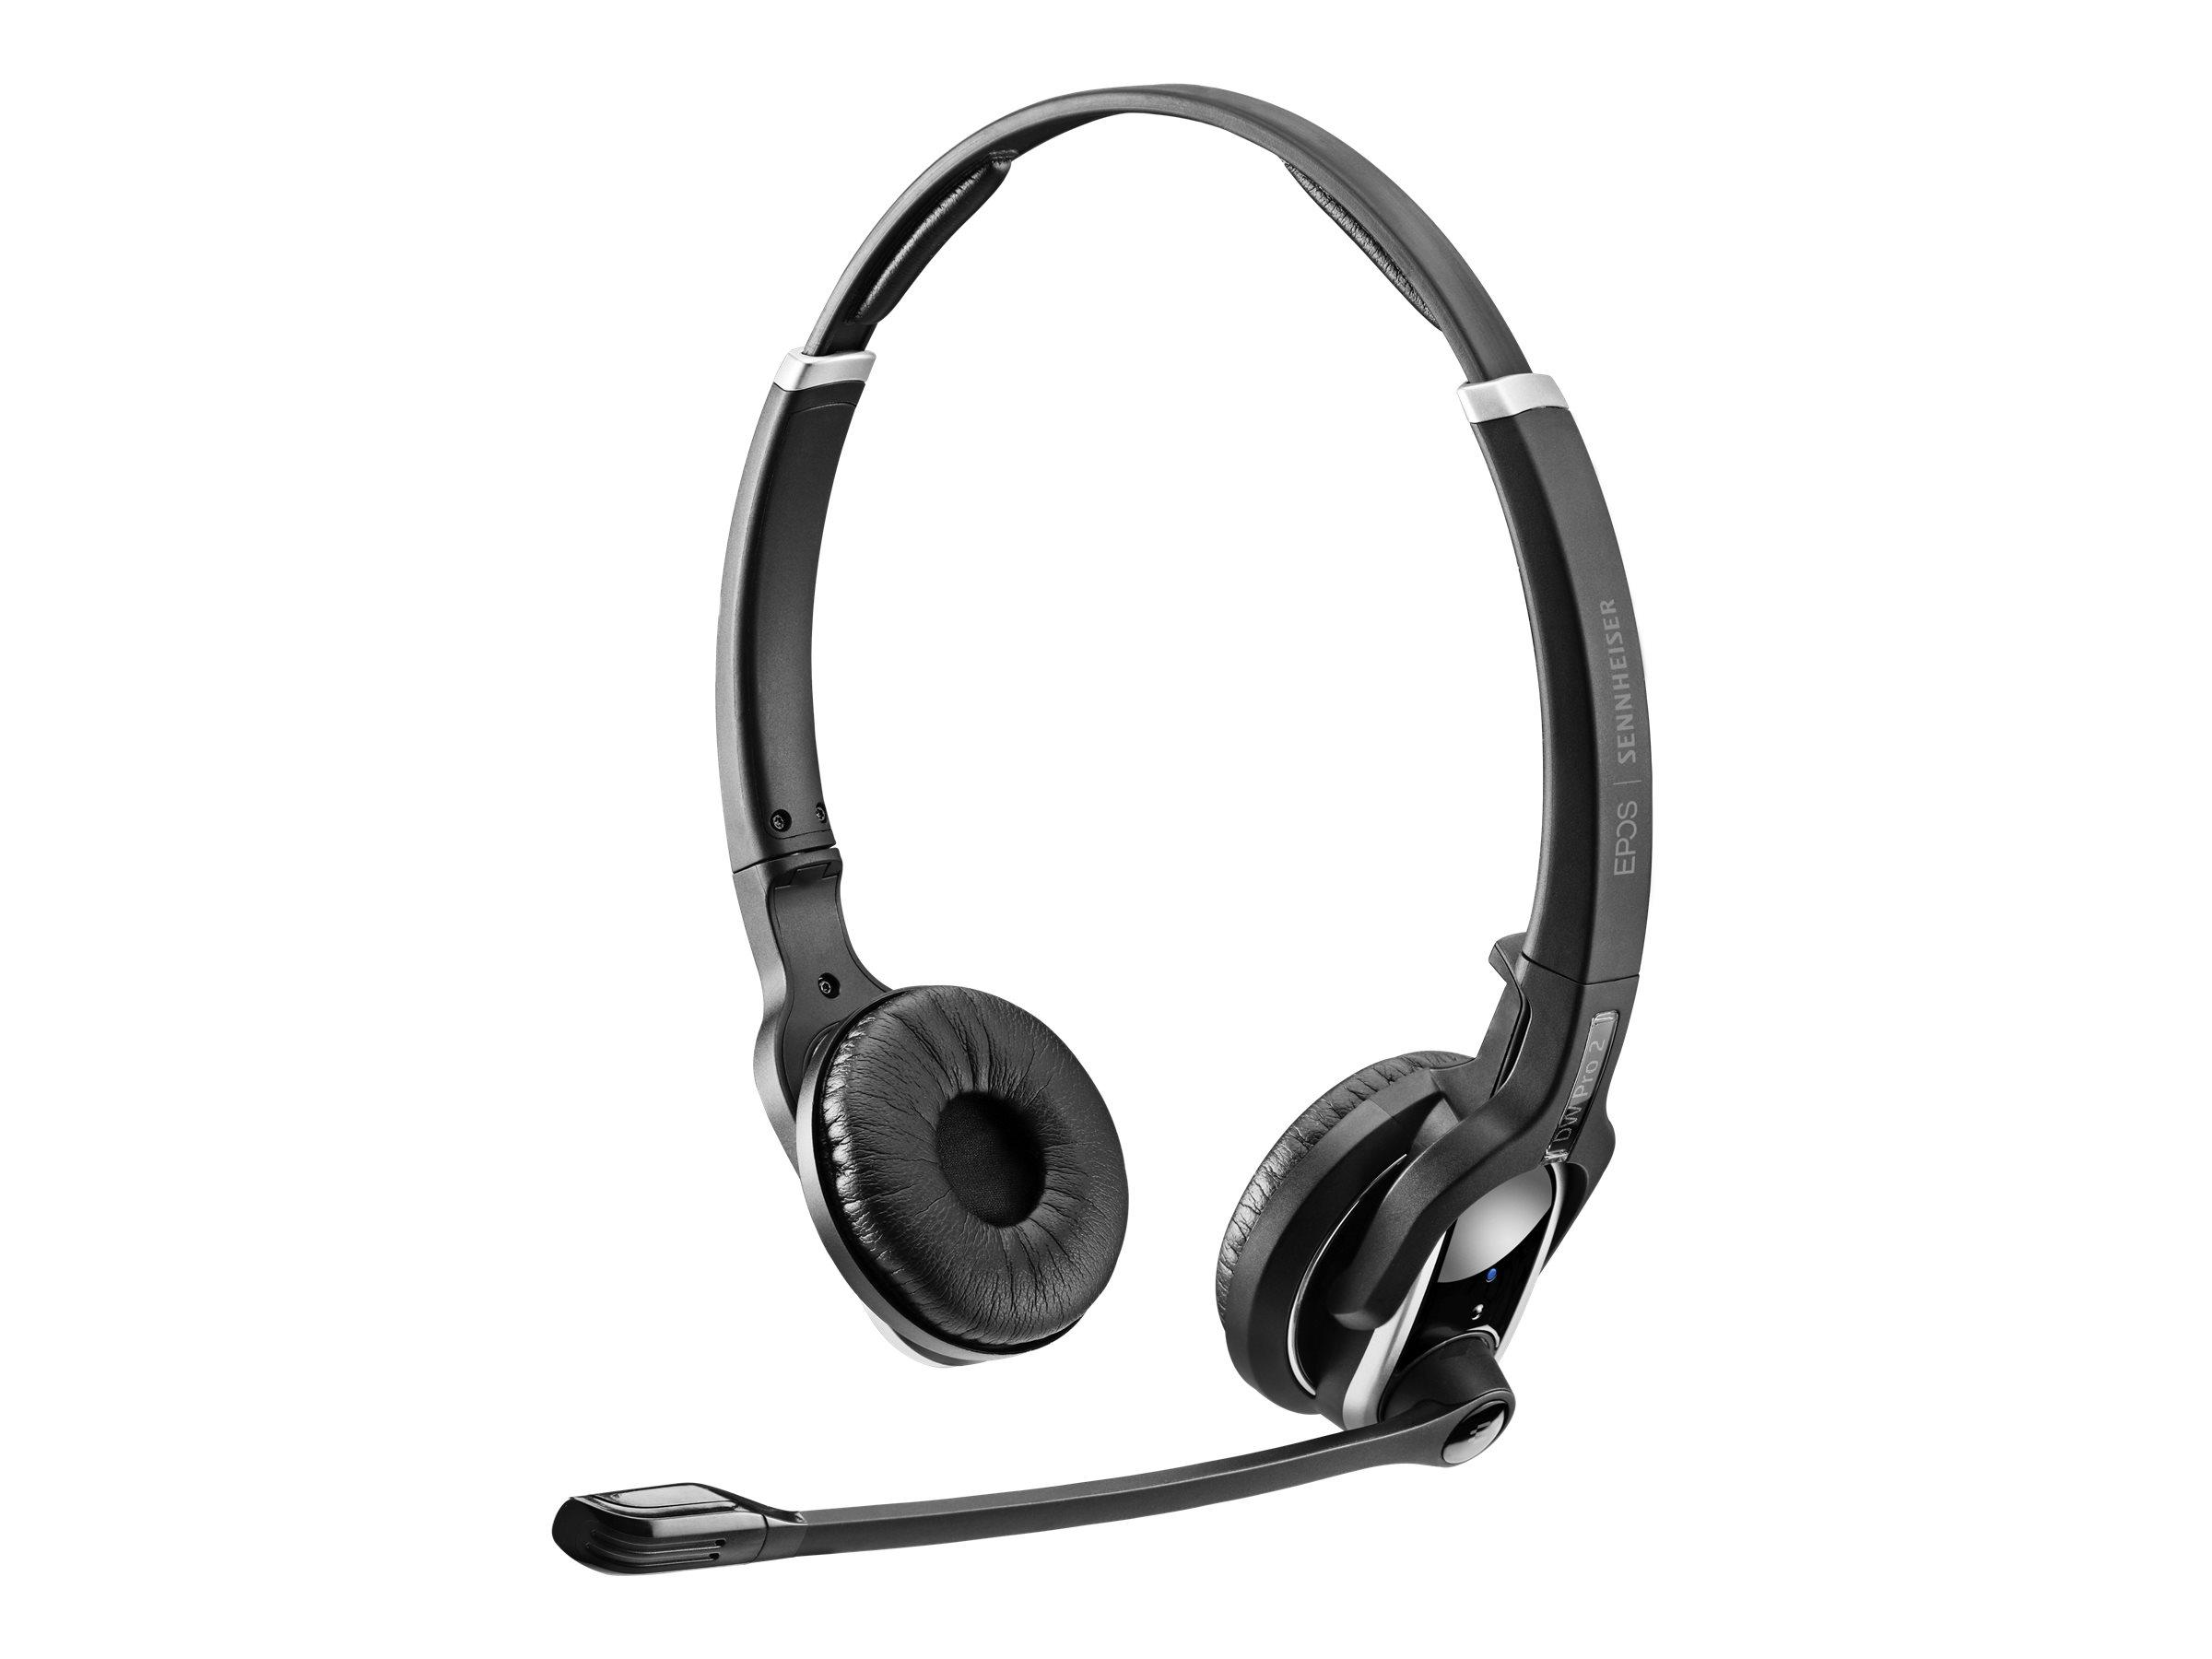 EPOS I SENNHEISER IMPACT DW 30 PHONE - Headset - konvertierbar - DECT CAT-iq - kabellos